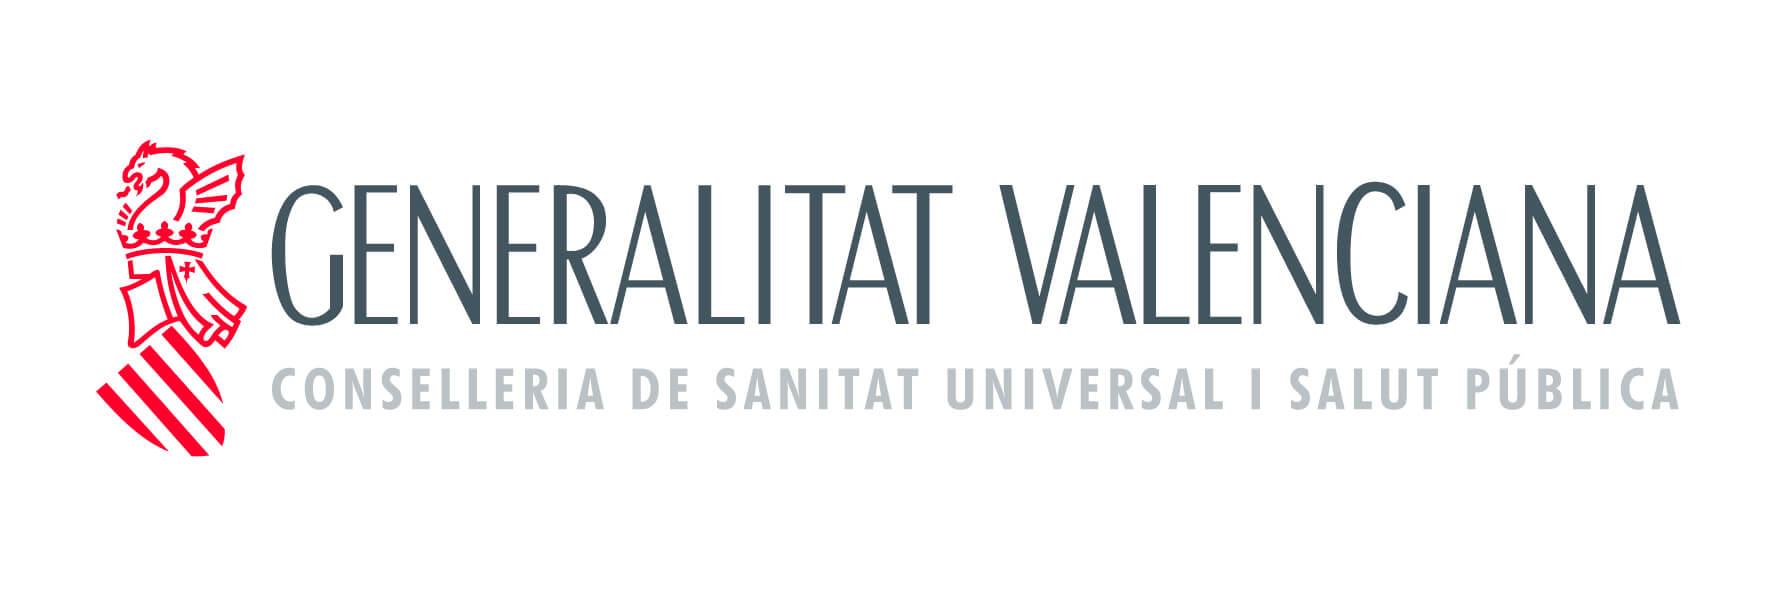 Conselleria de Sanidad Valenciana